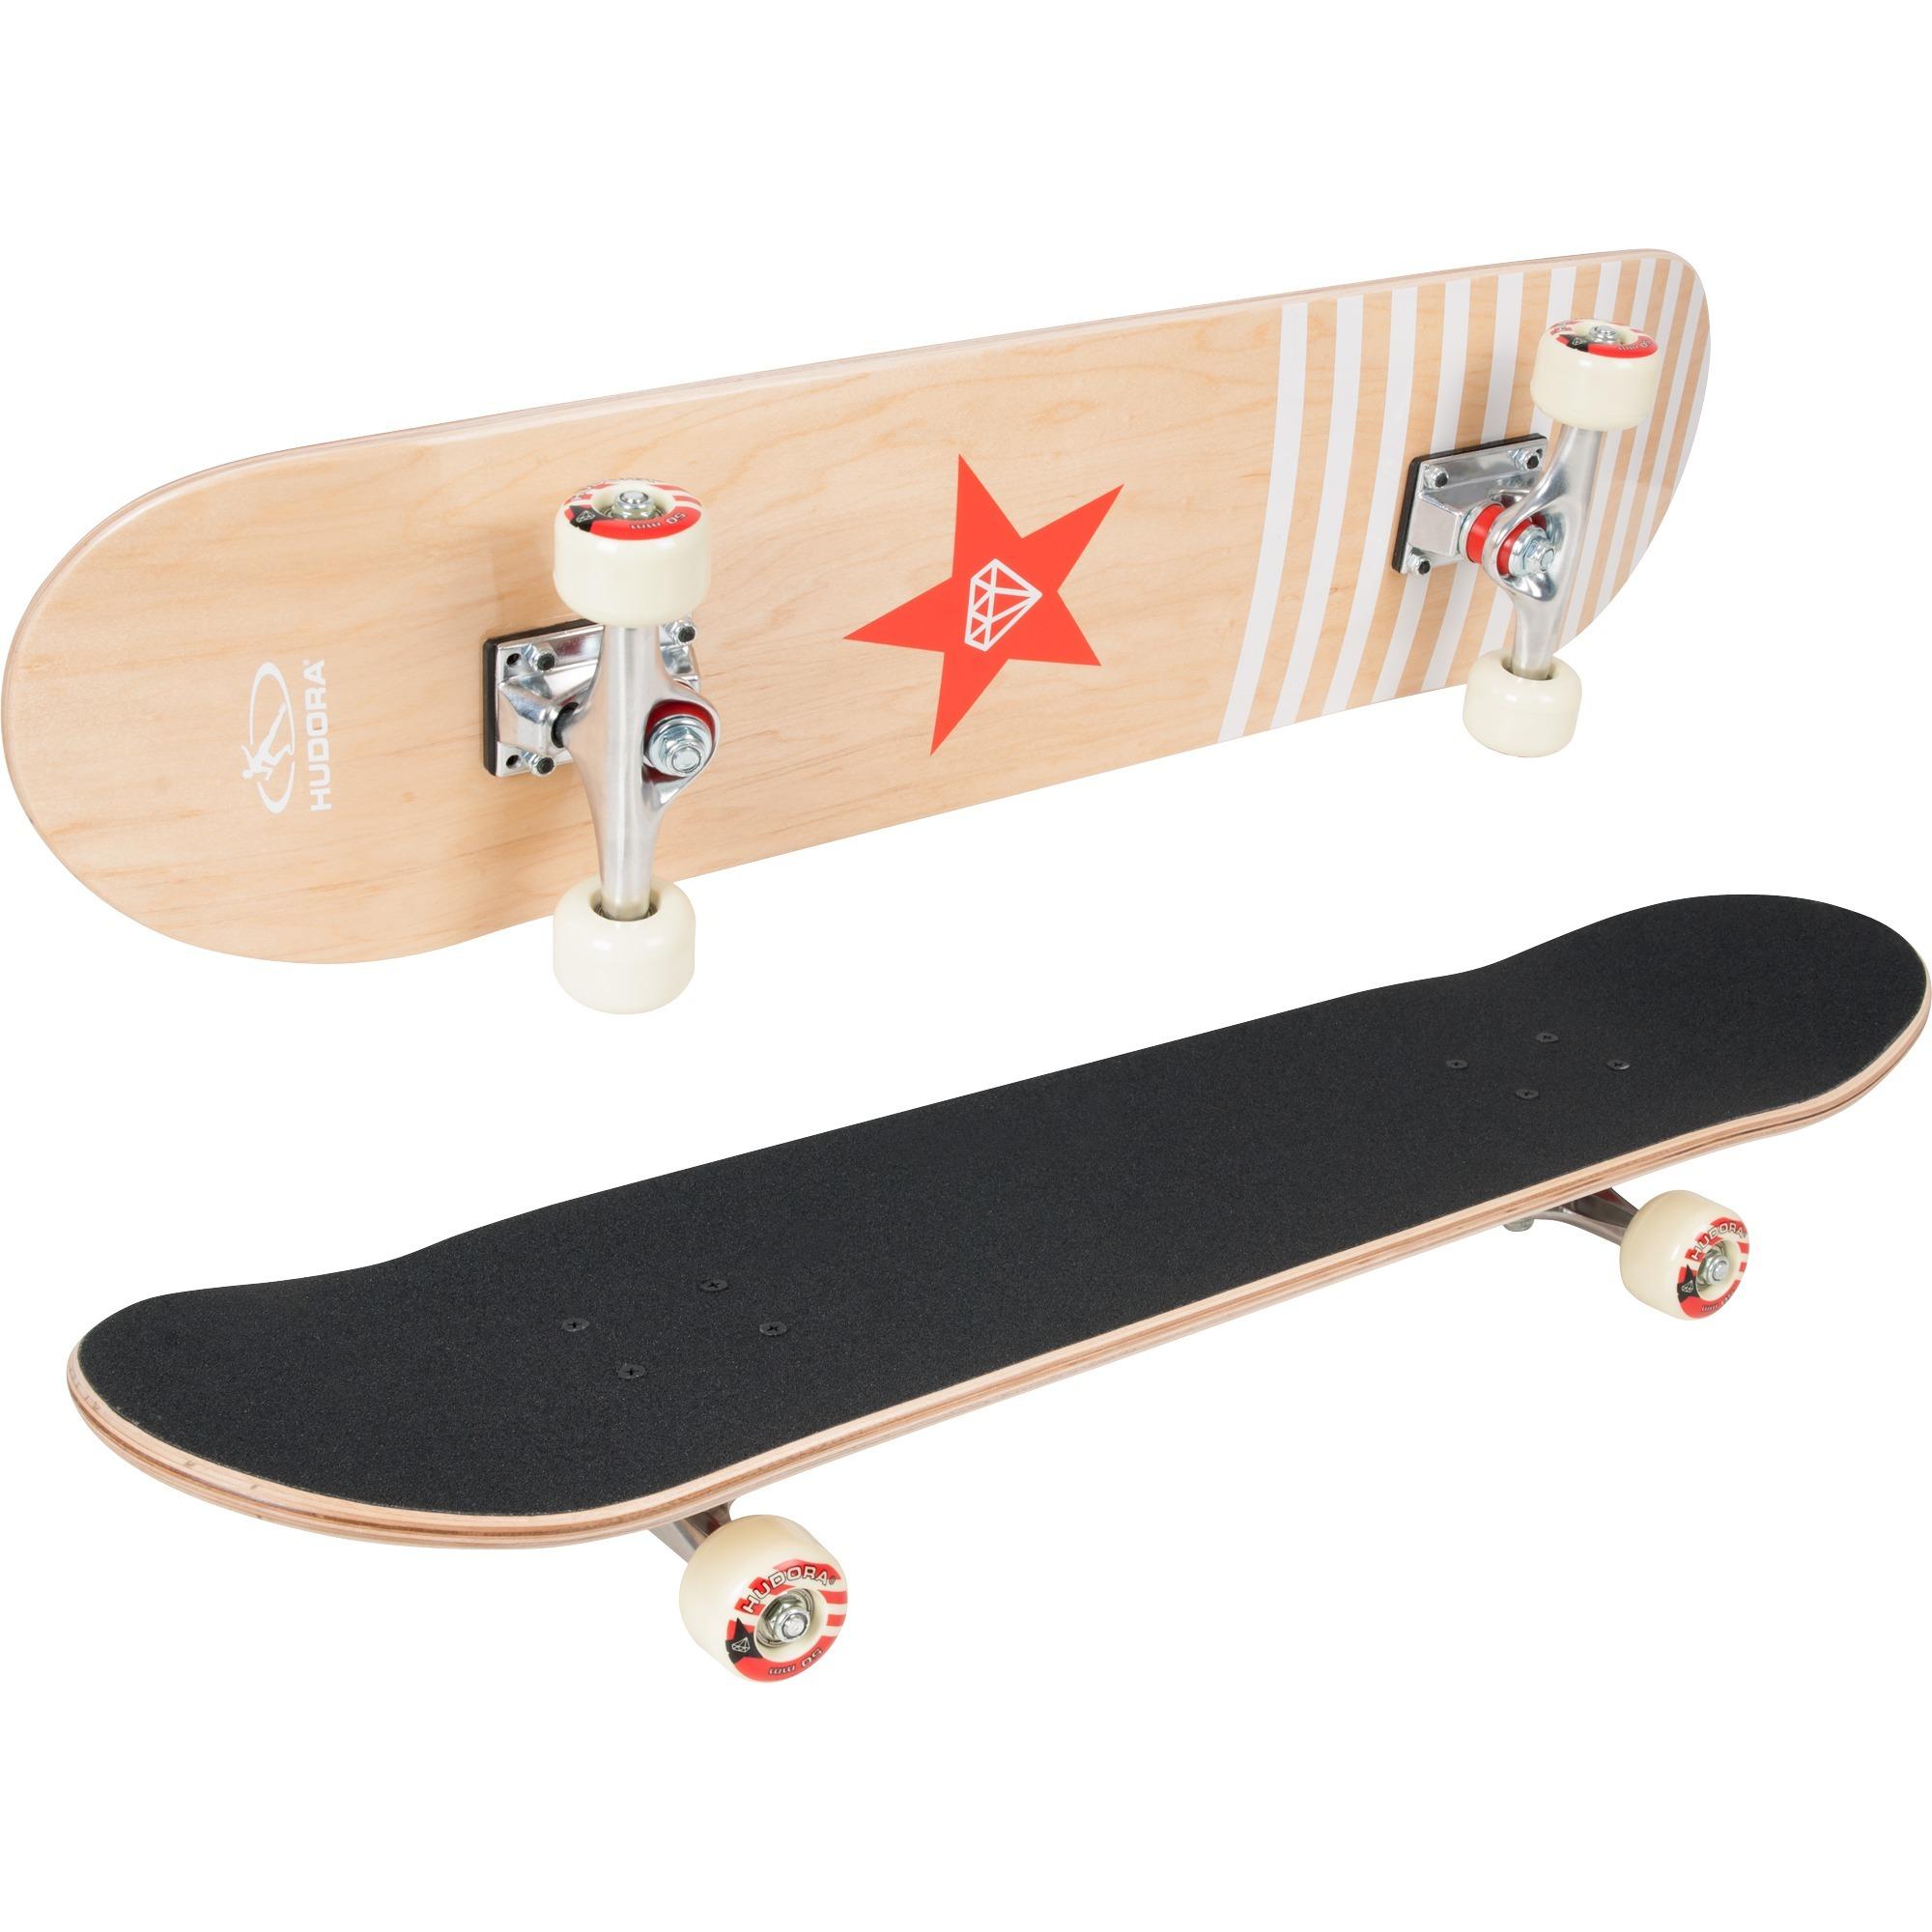 Skateboard Beverly Hills ABEC 1, Planche à roulettes